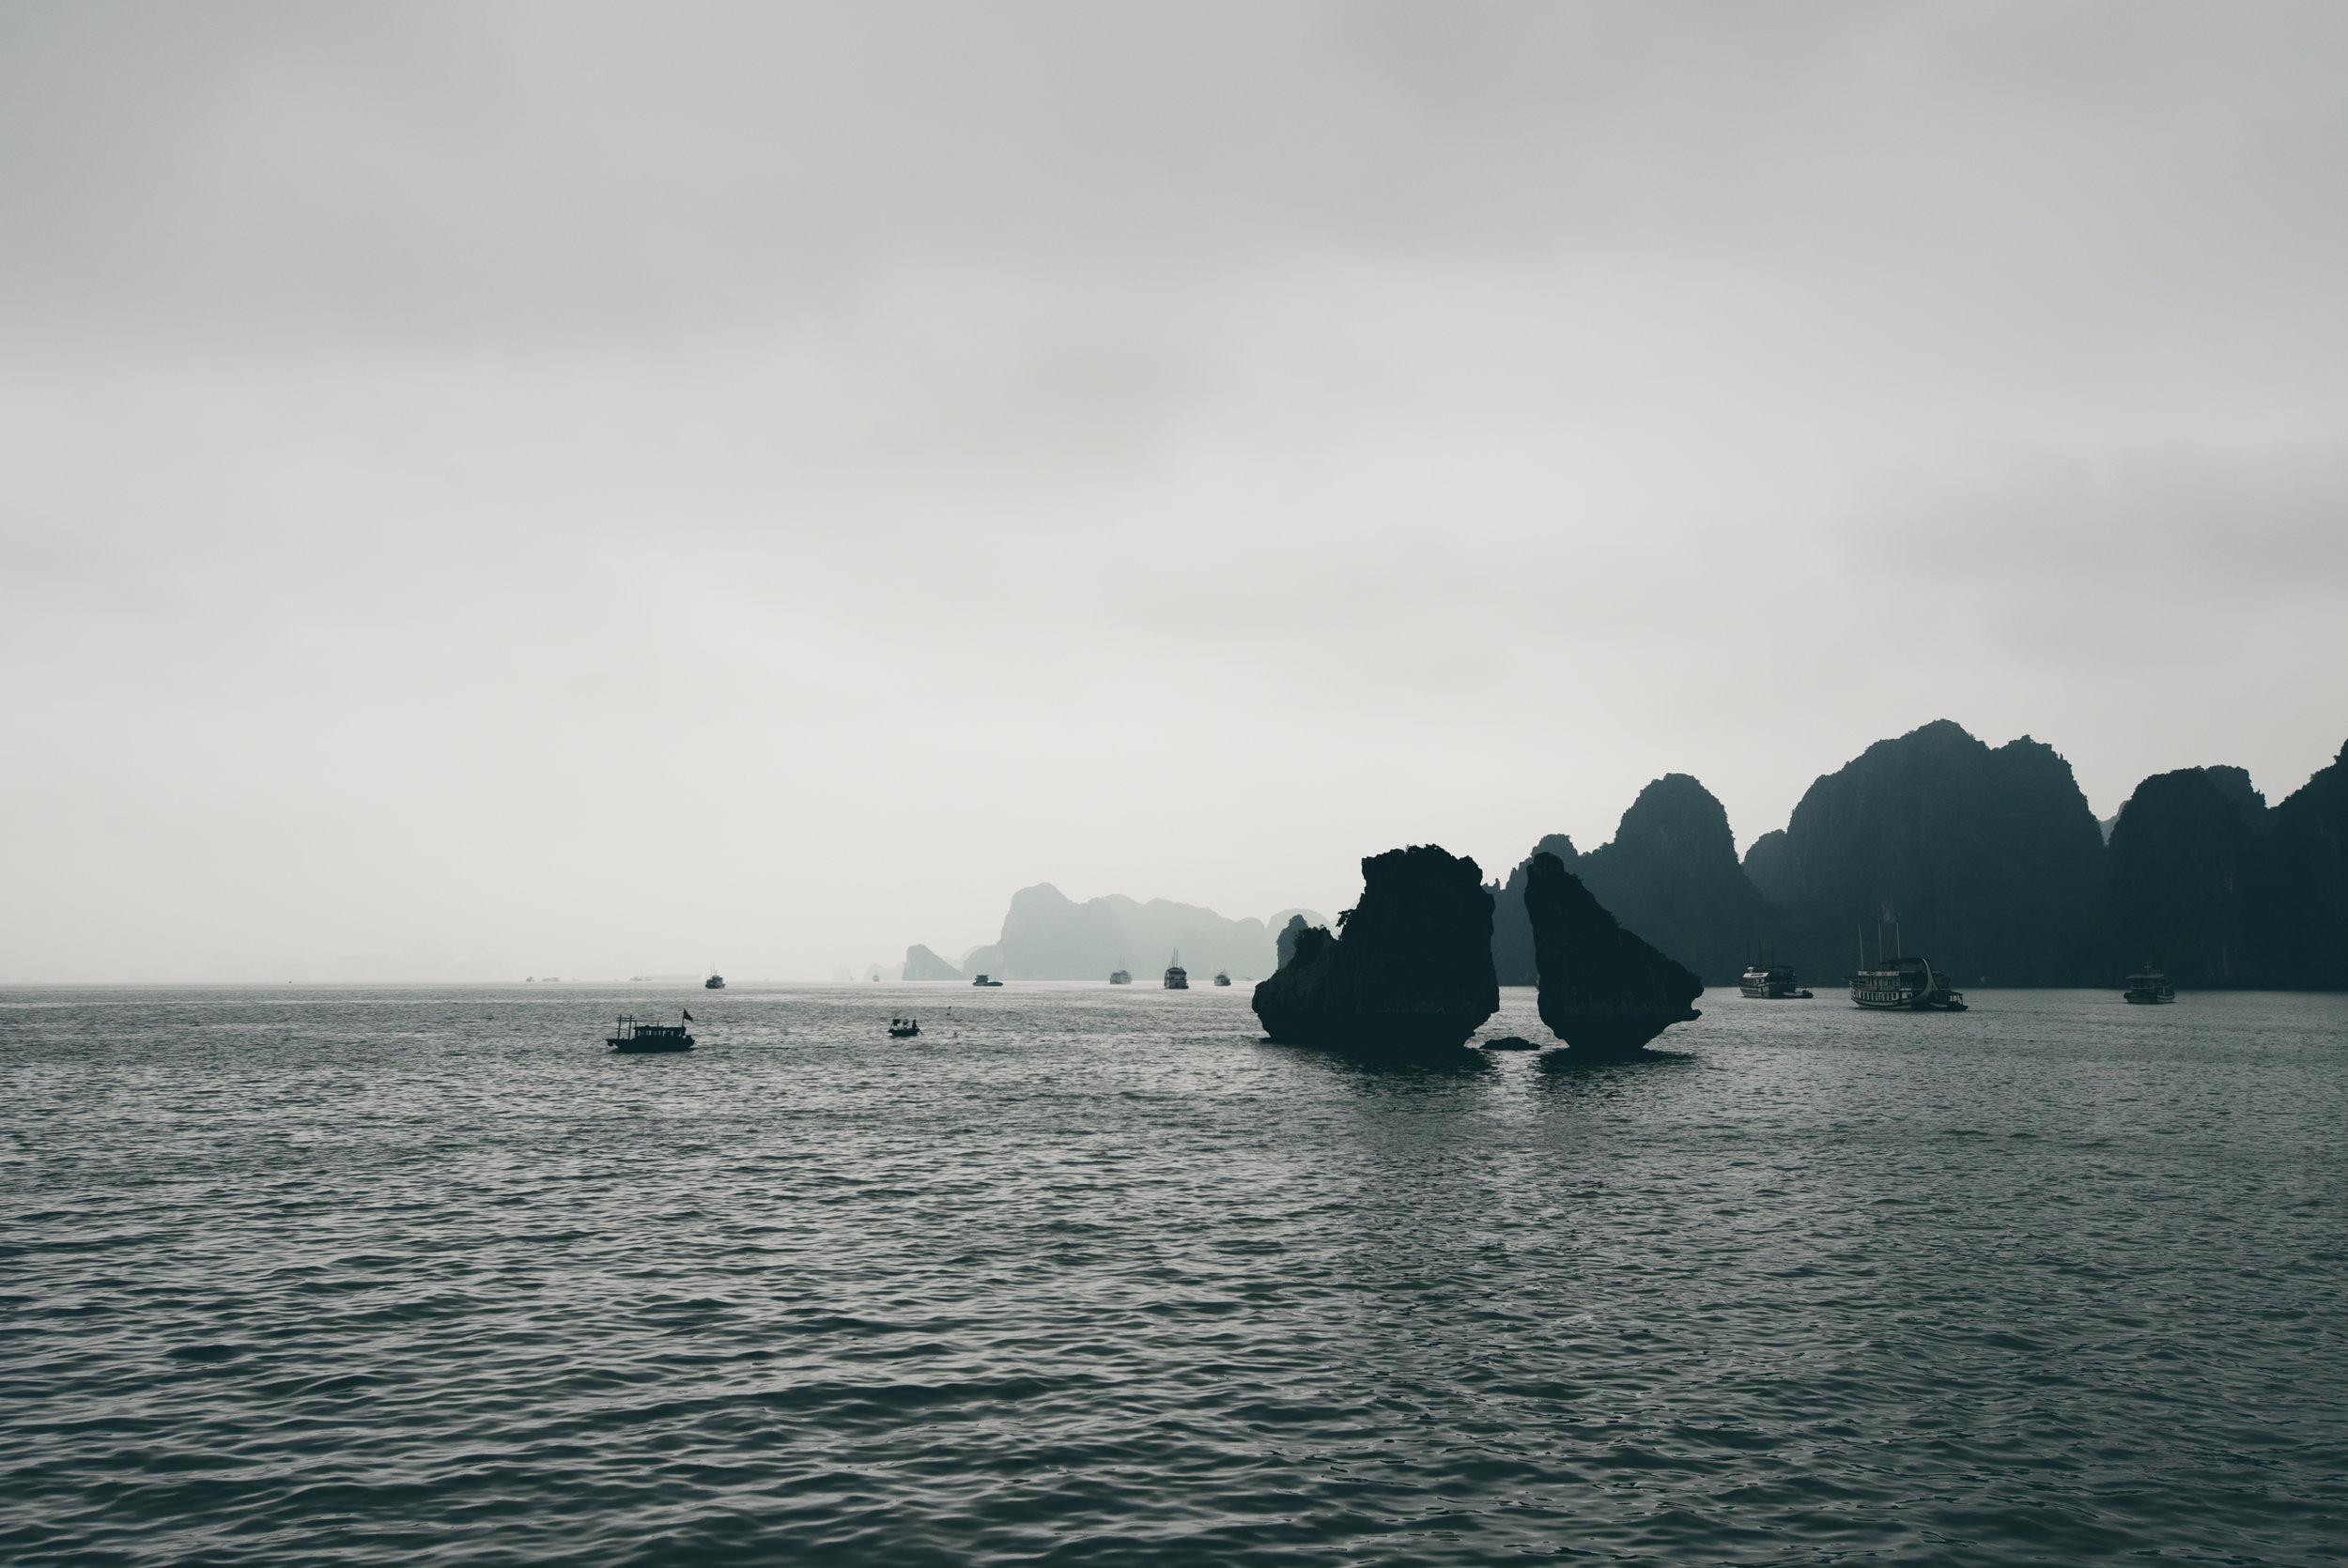 20170424_Vietnam_00032.jpg